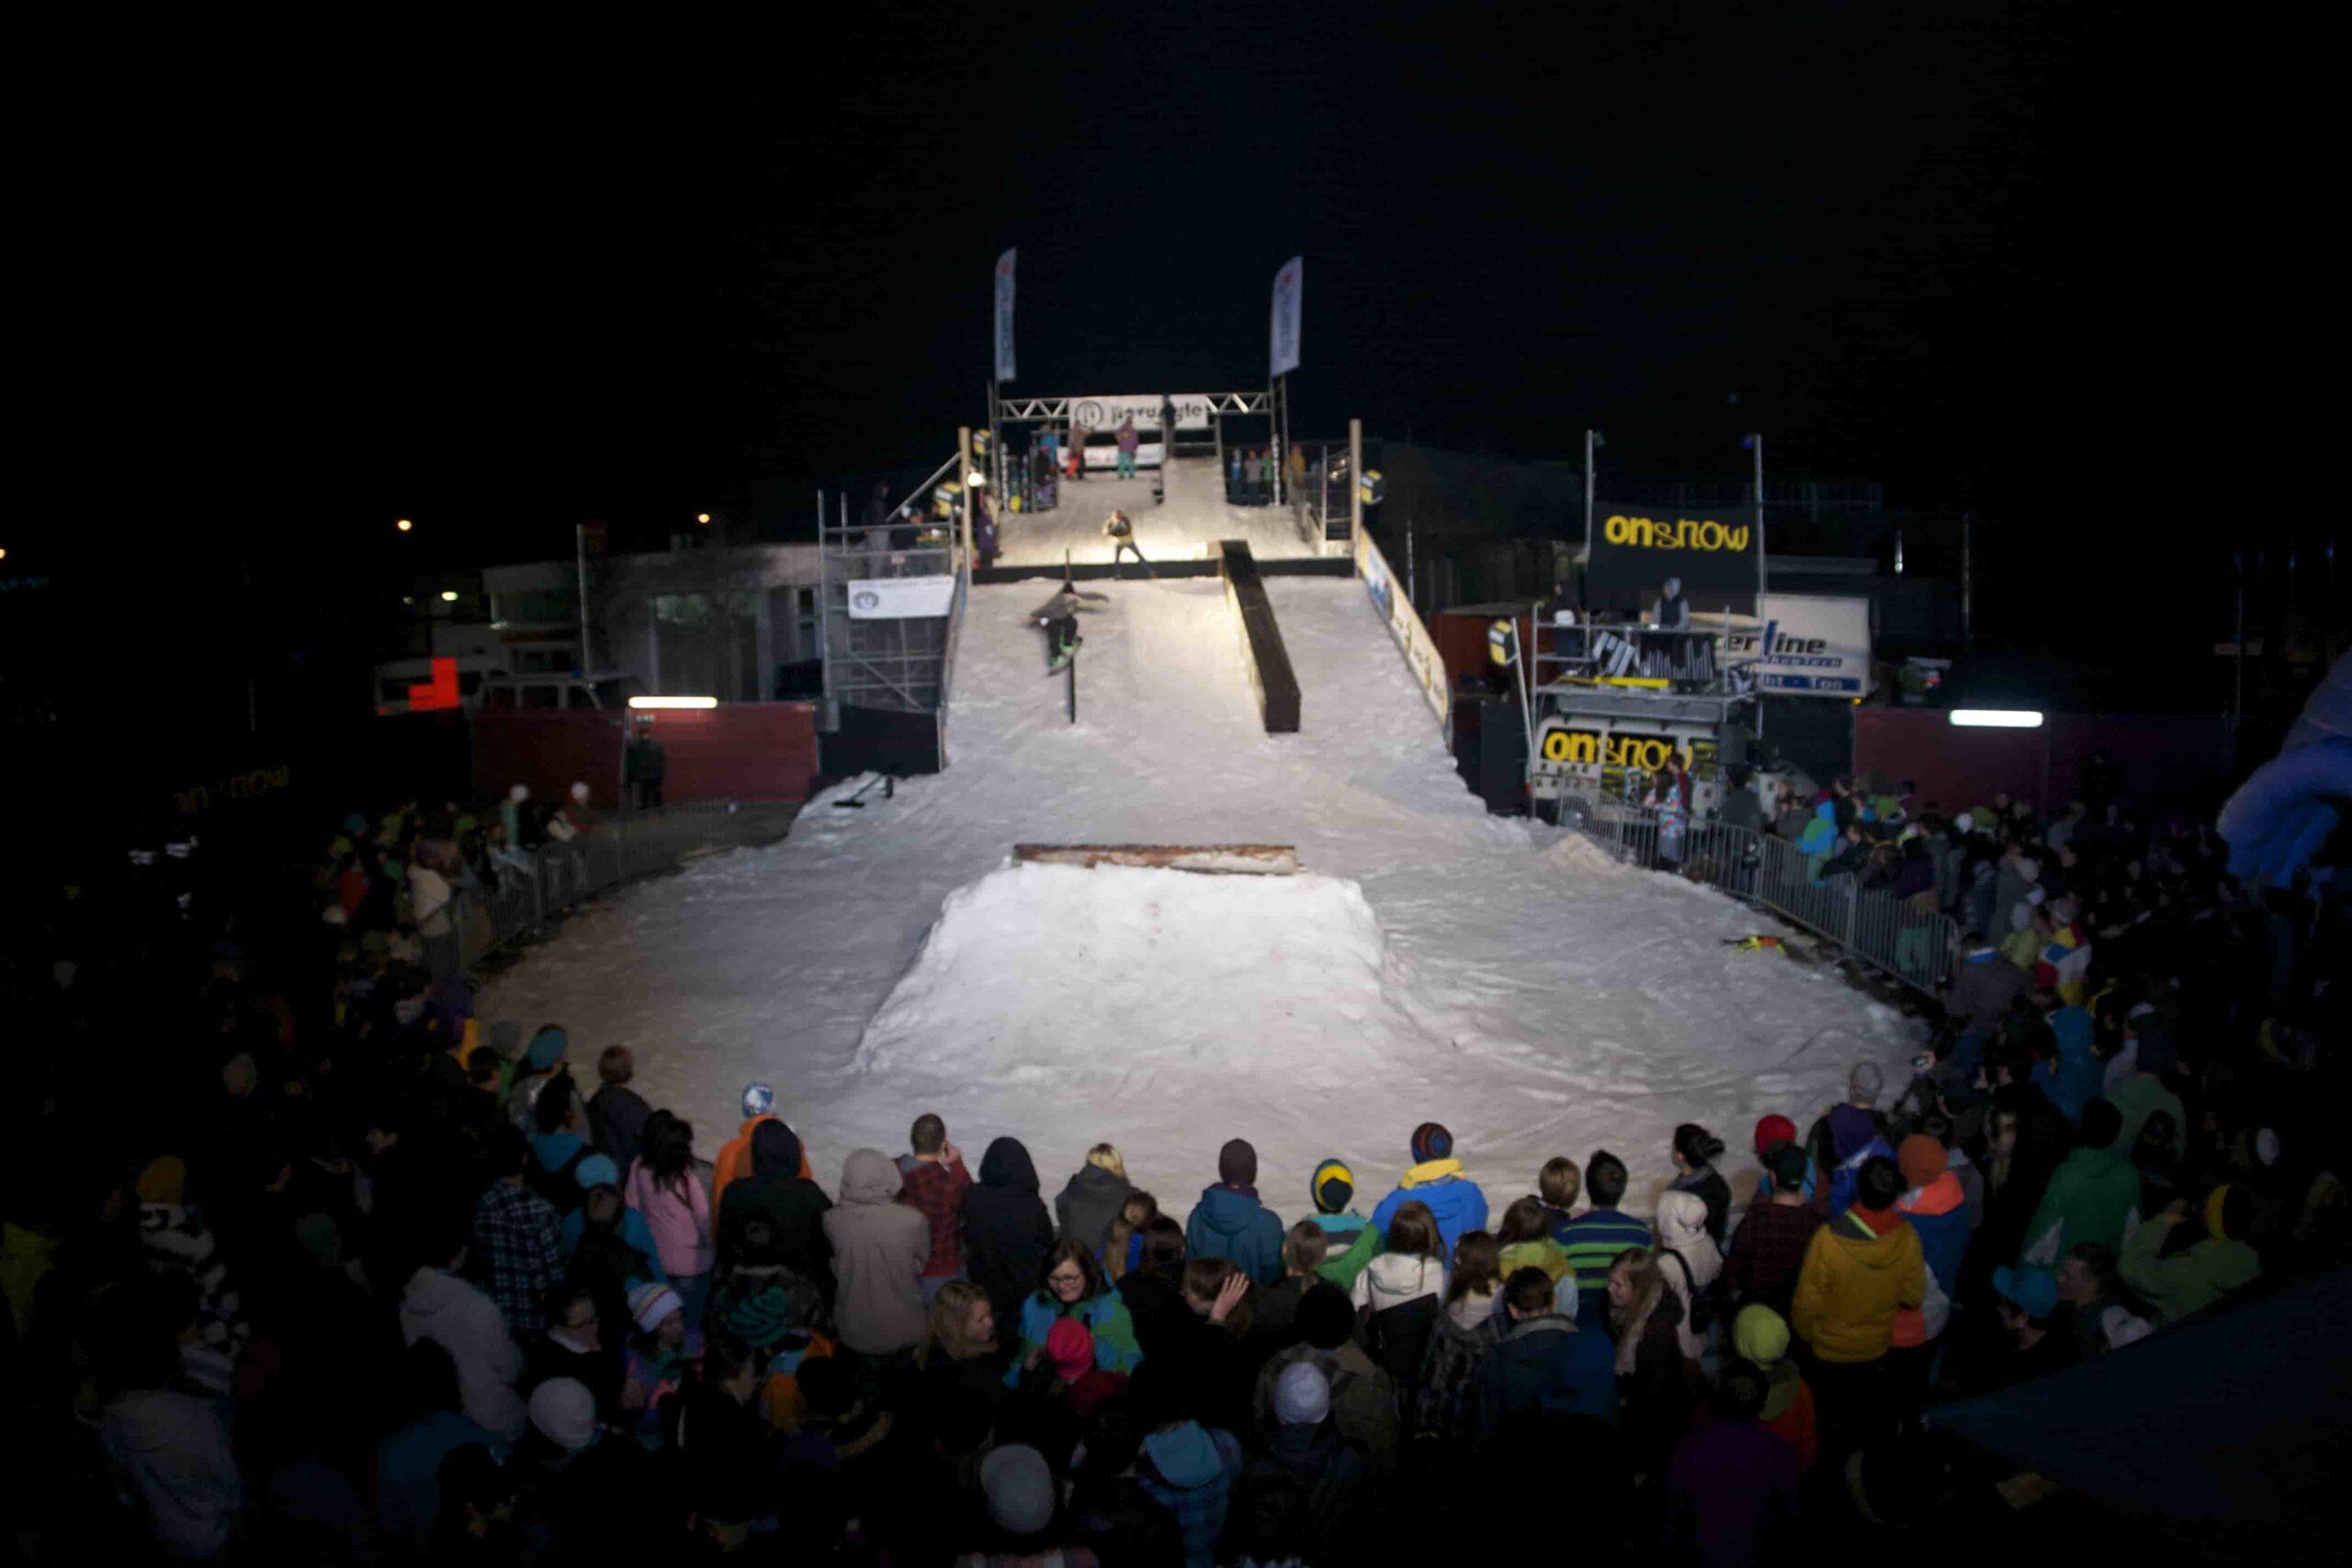 Event «On Snow» in Dornbirn